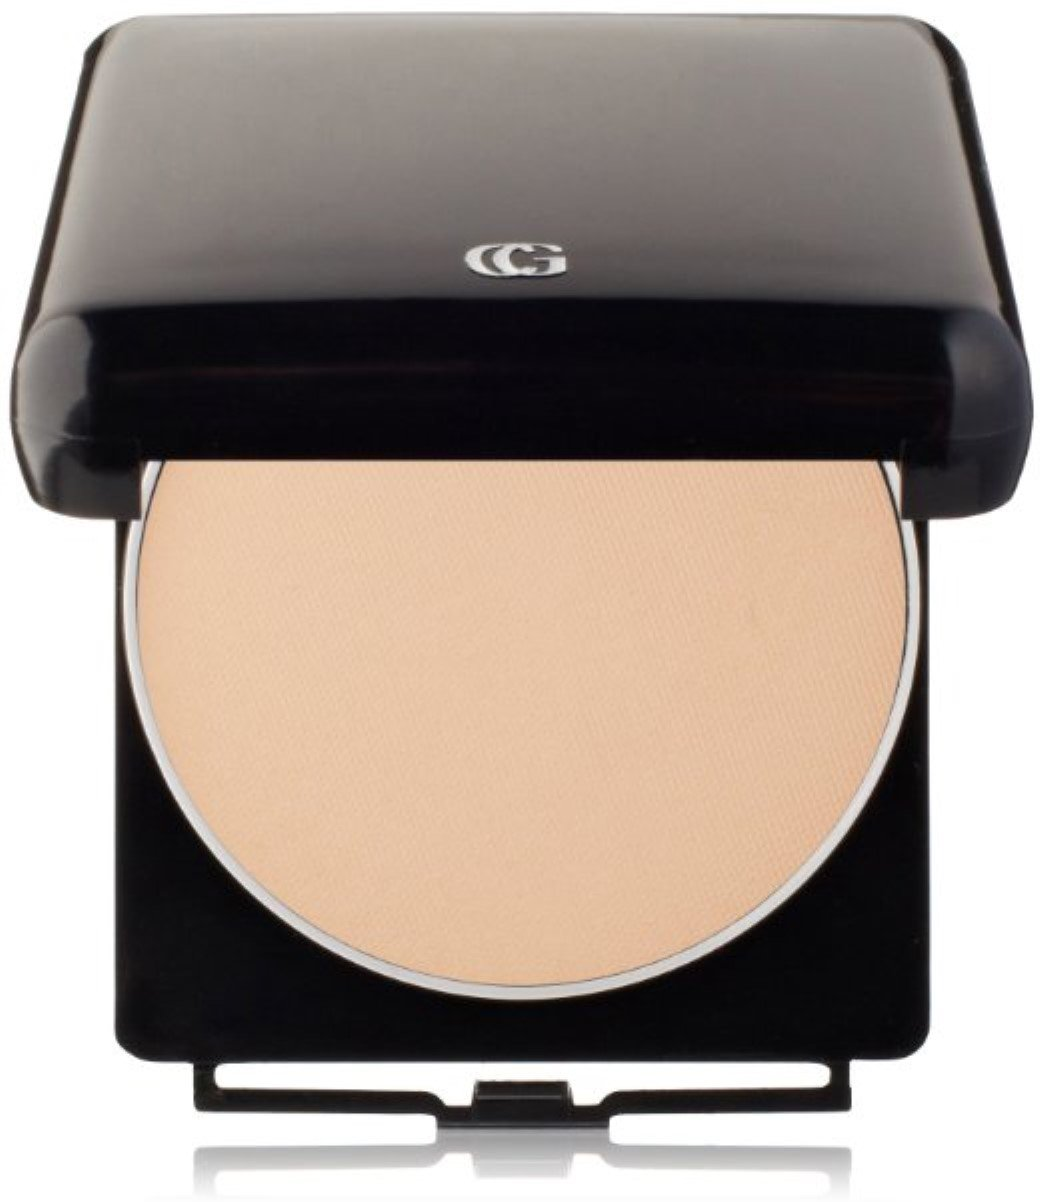 CoverGirl Simply Powder Foundation, Ivory (505), 0.41 oz